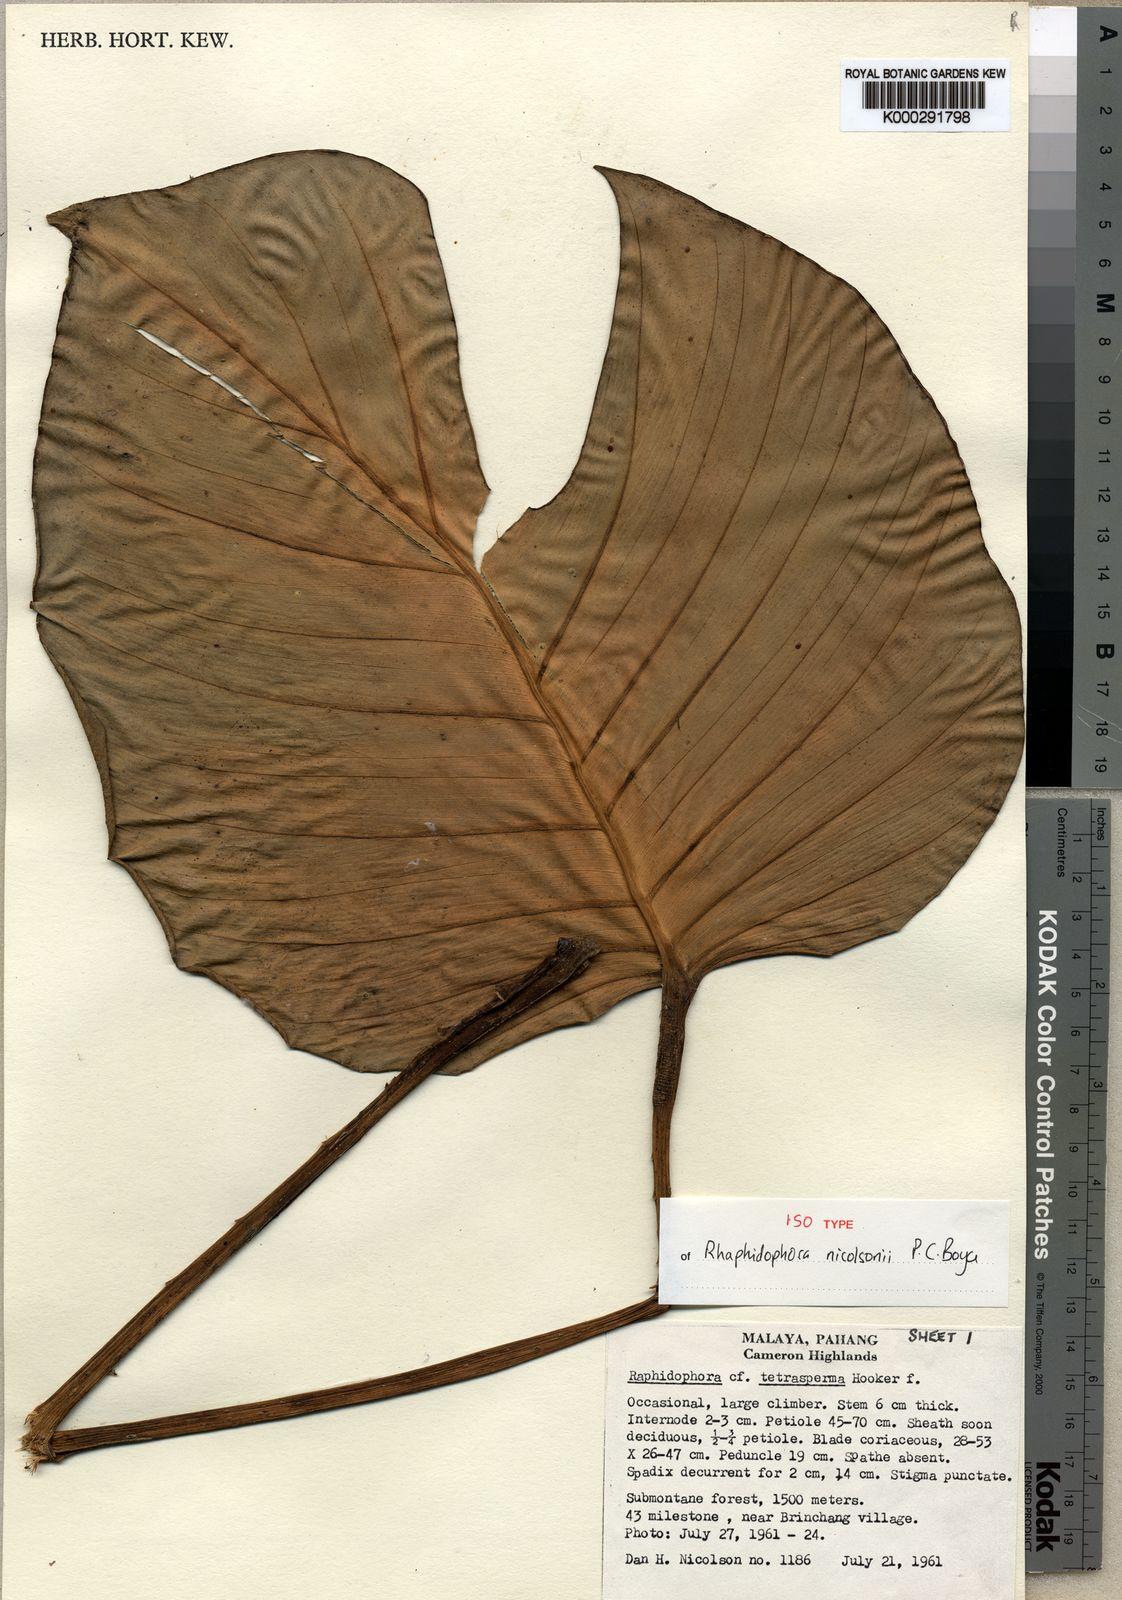 Rhaphidophora Nicolsonii P C Boyce Plants Of The World Online